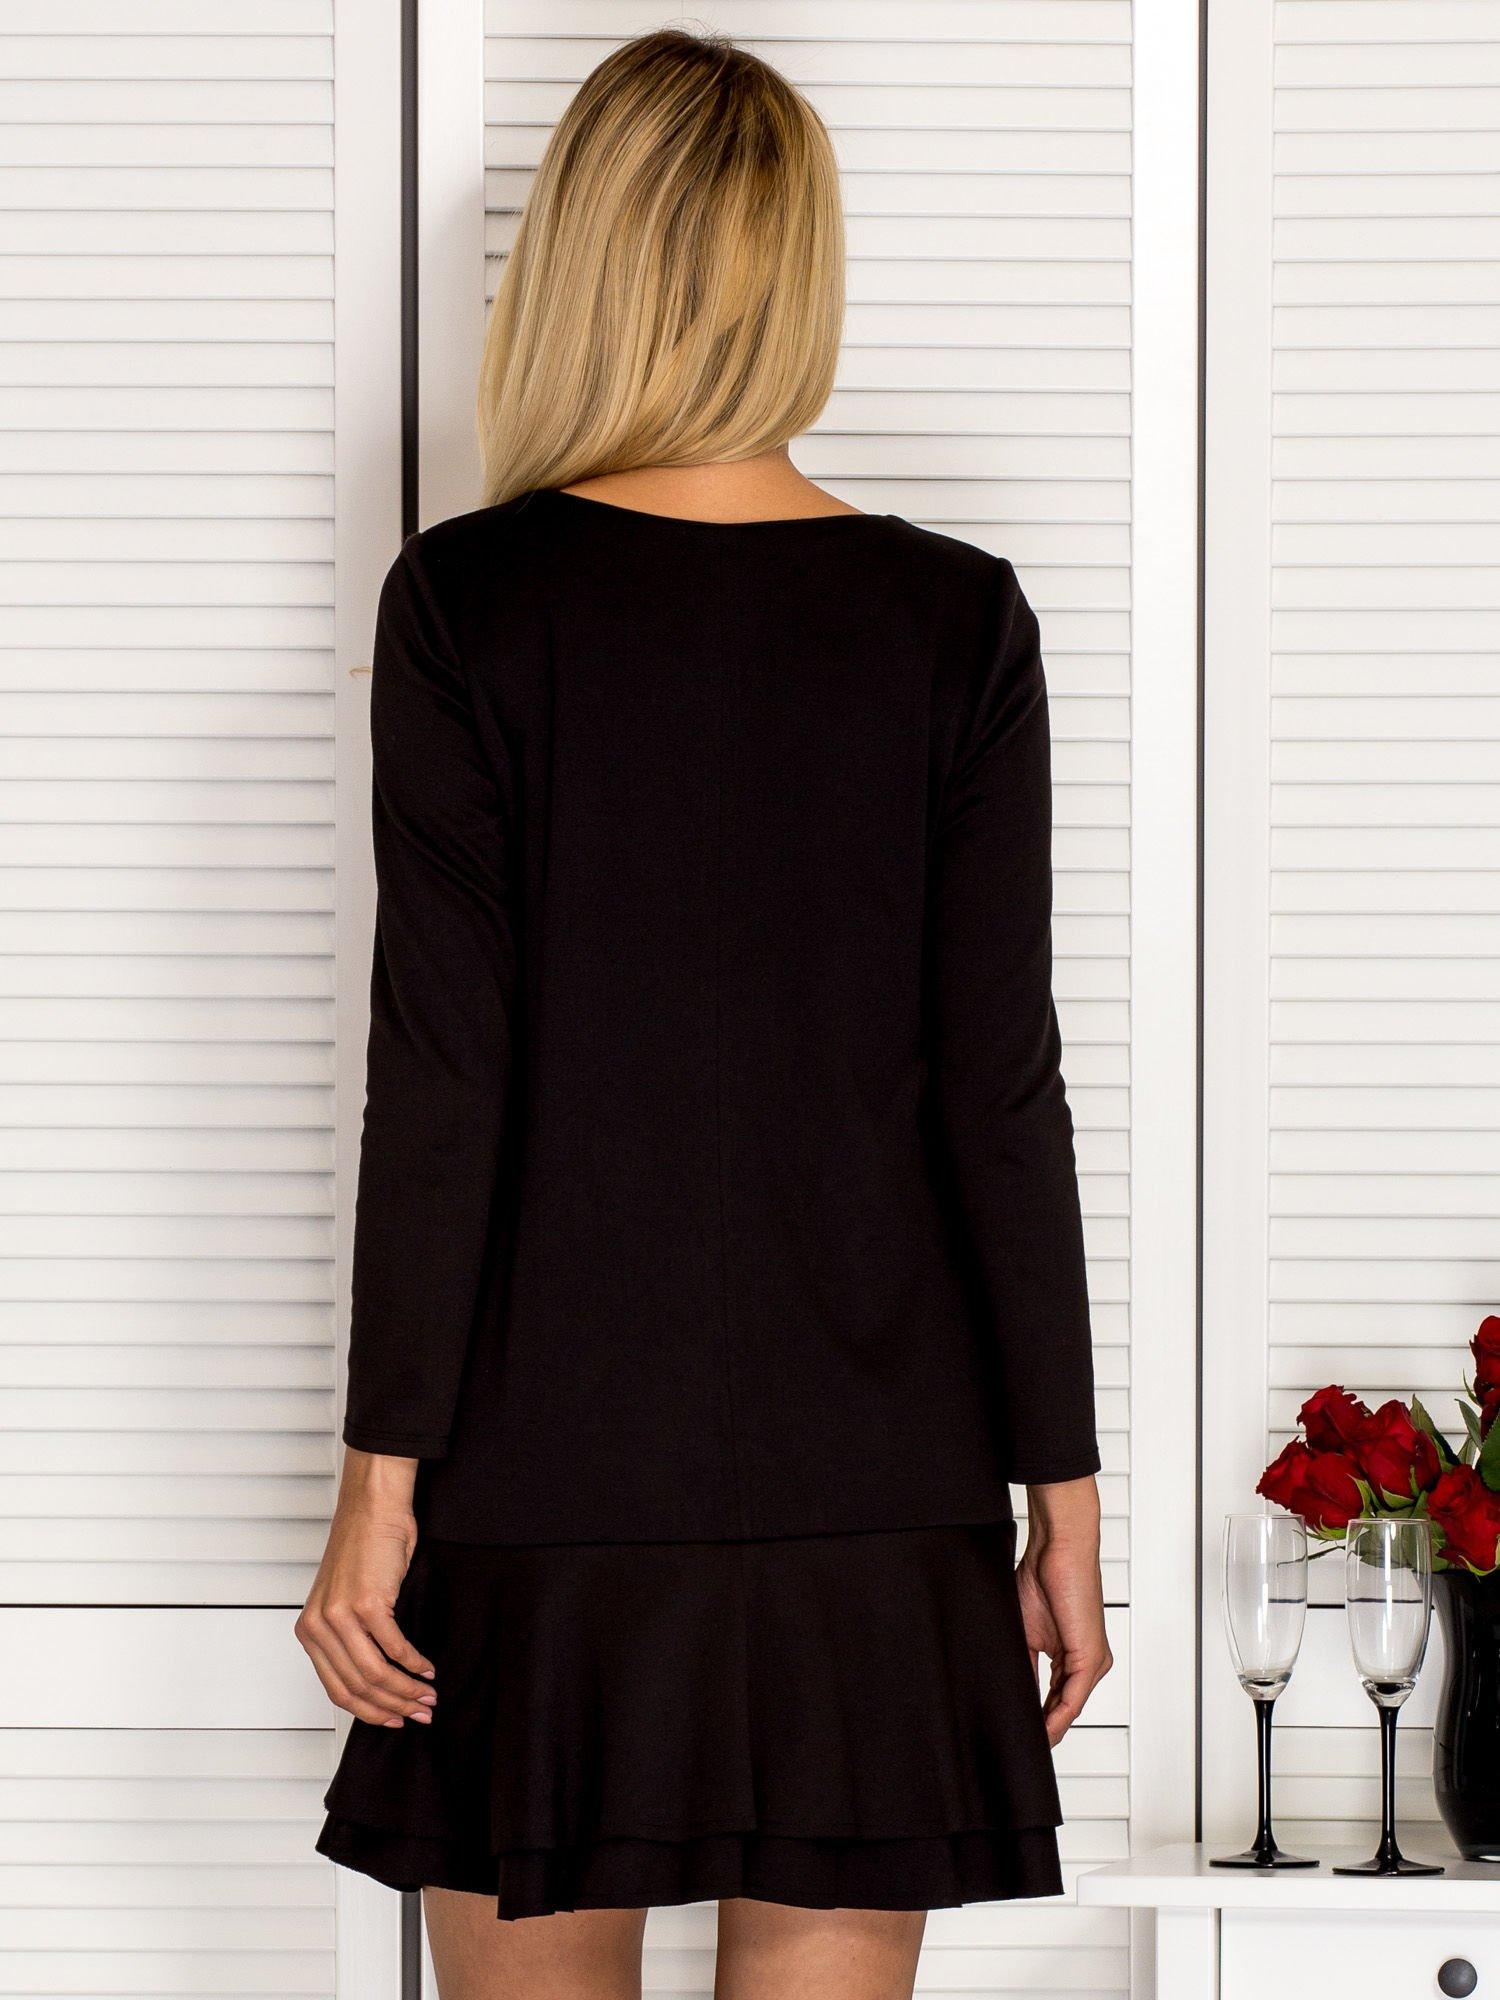 418a089aba Sukienka damska z falbaną na dole czarna - Sukienka z falbaną ...